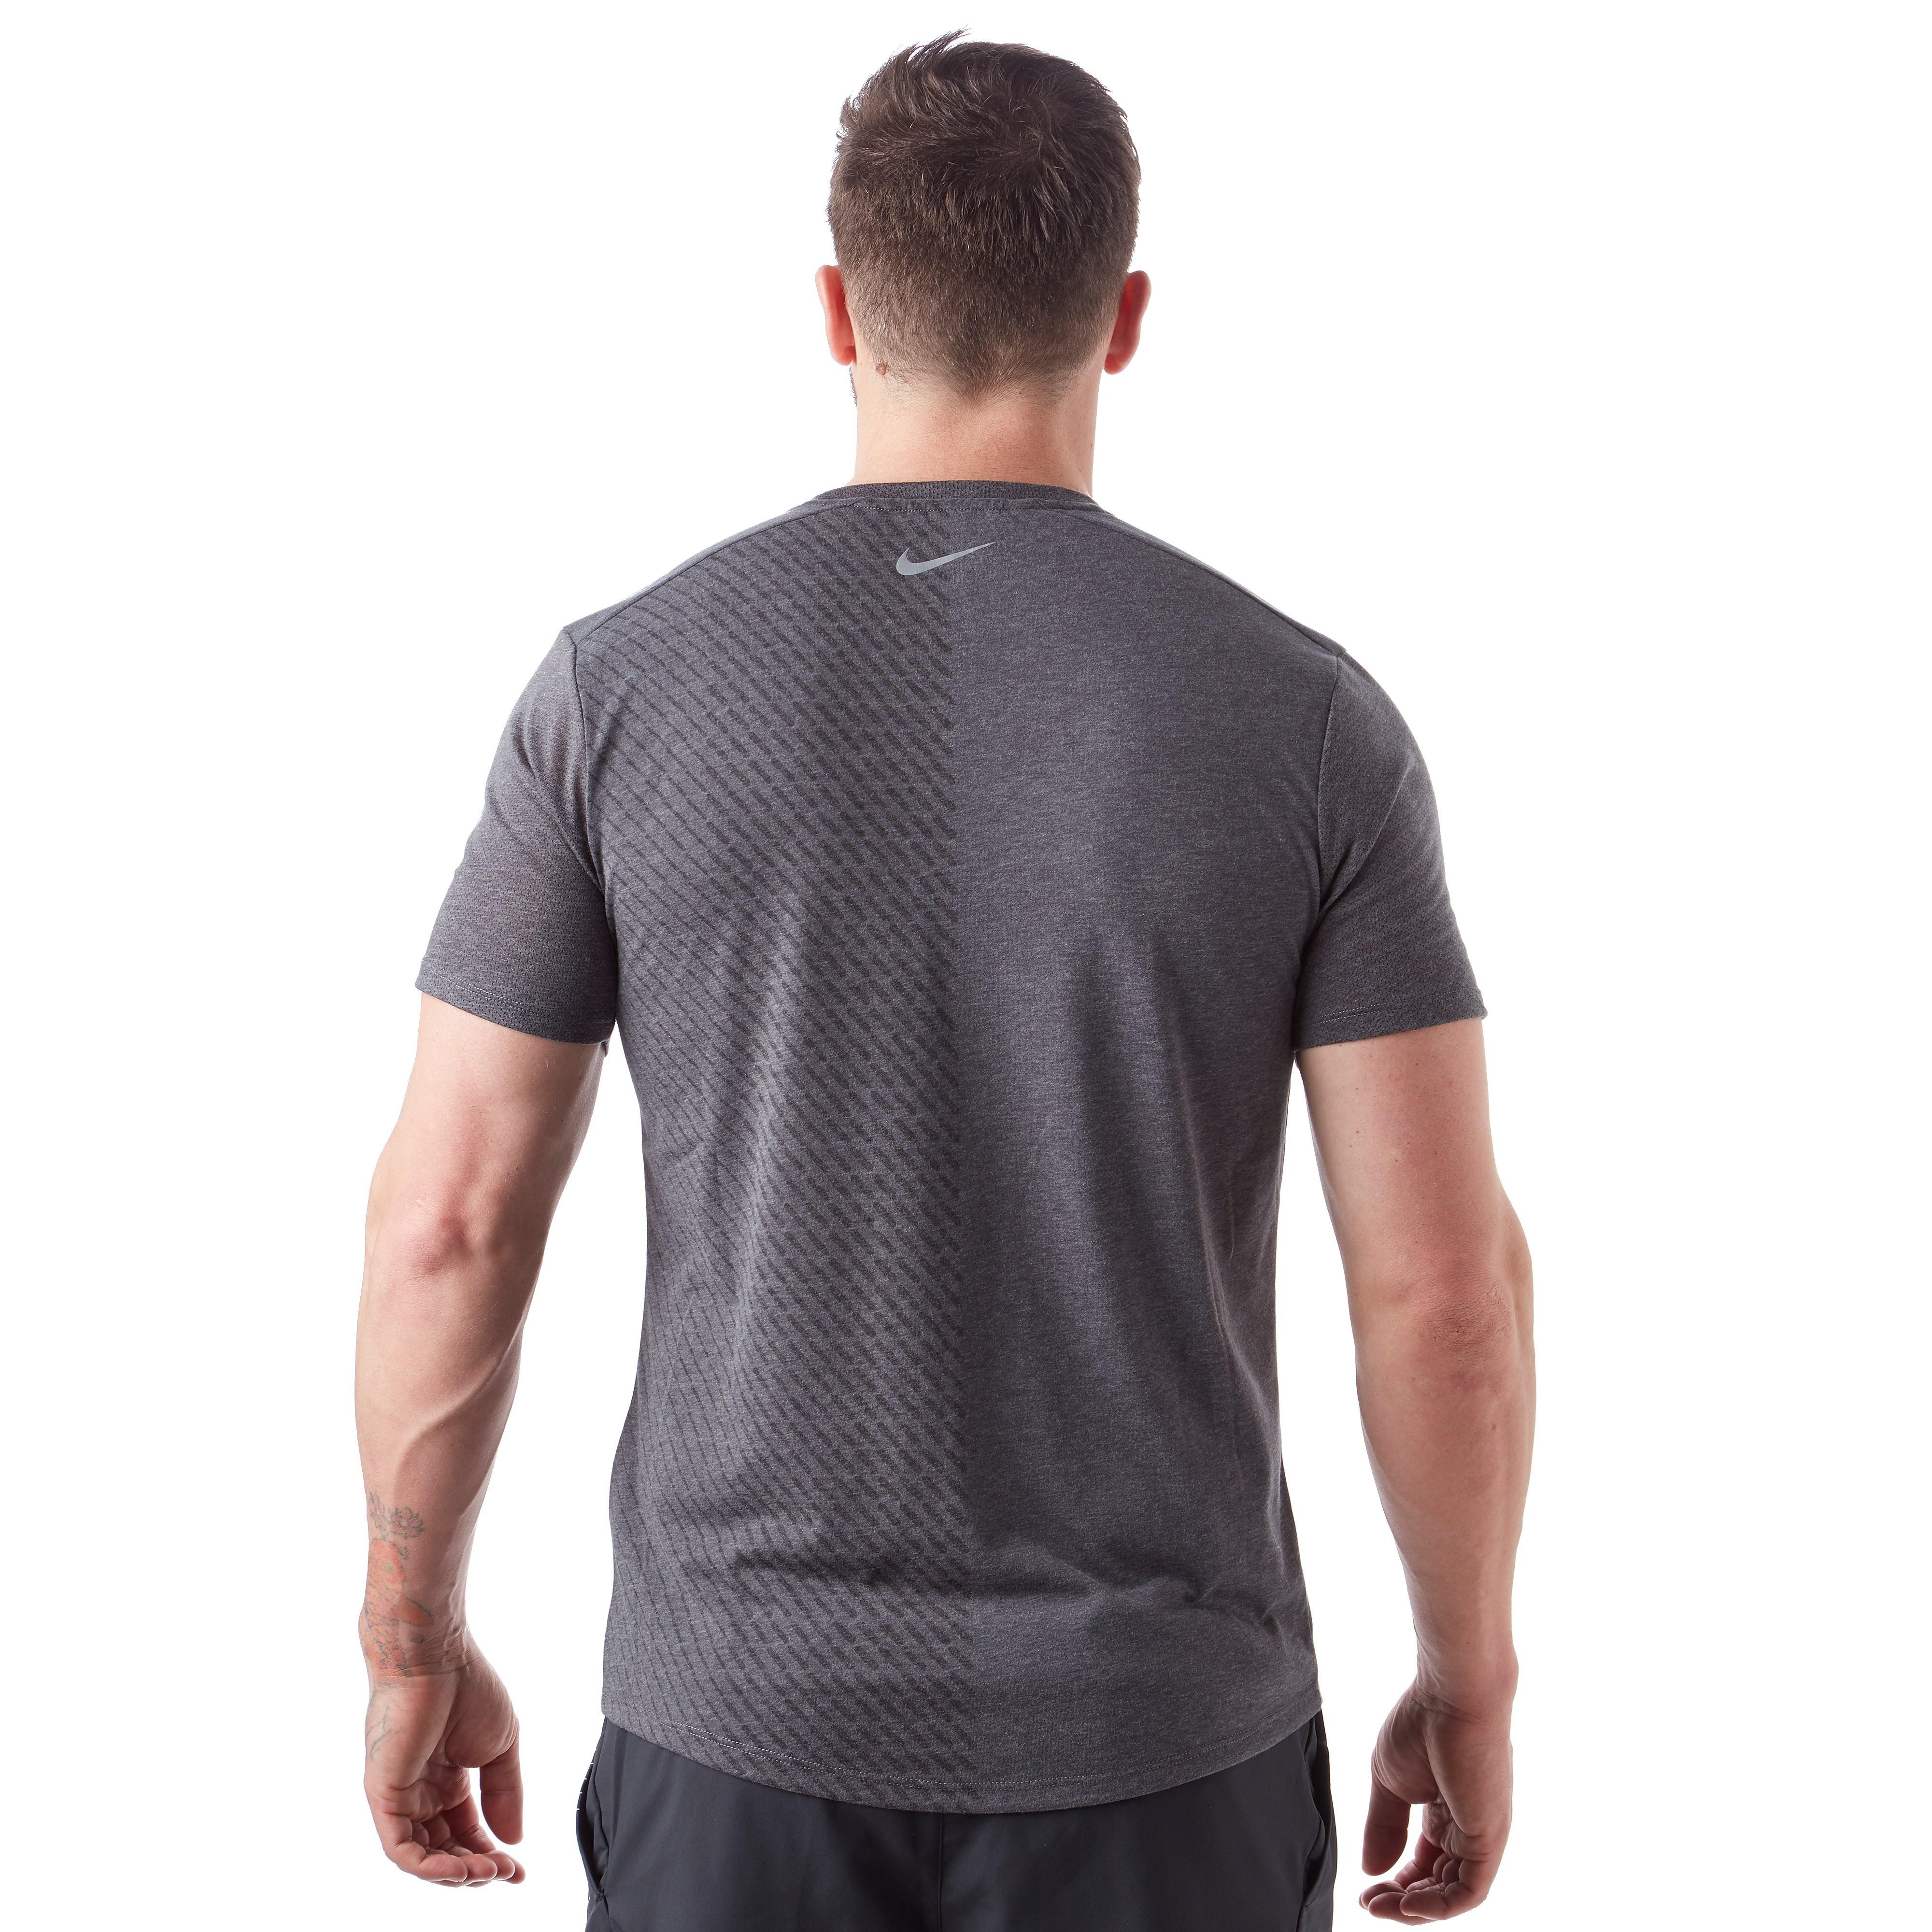 Nike Tailwind Short Sleeve Printed Men's Running